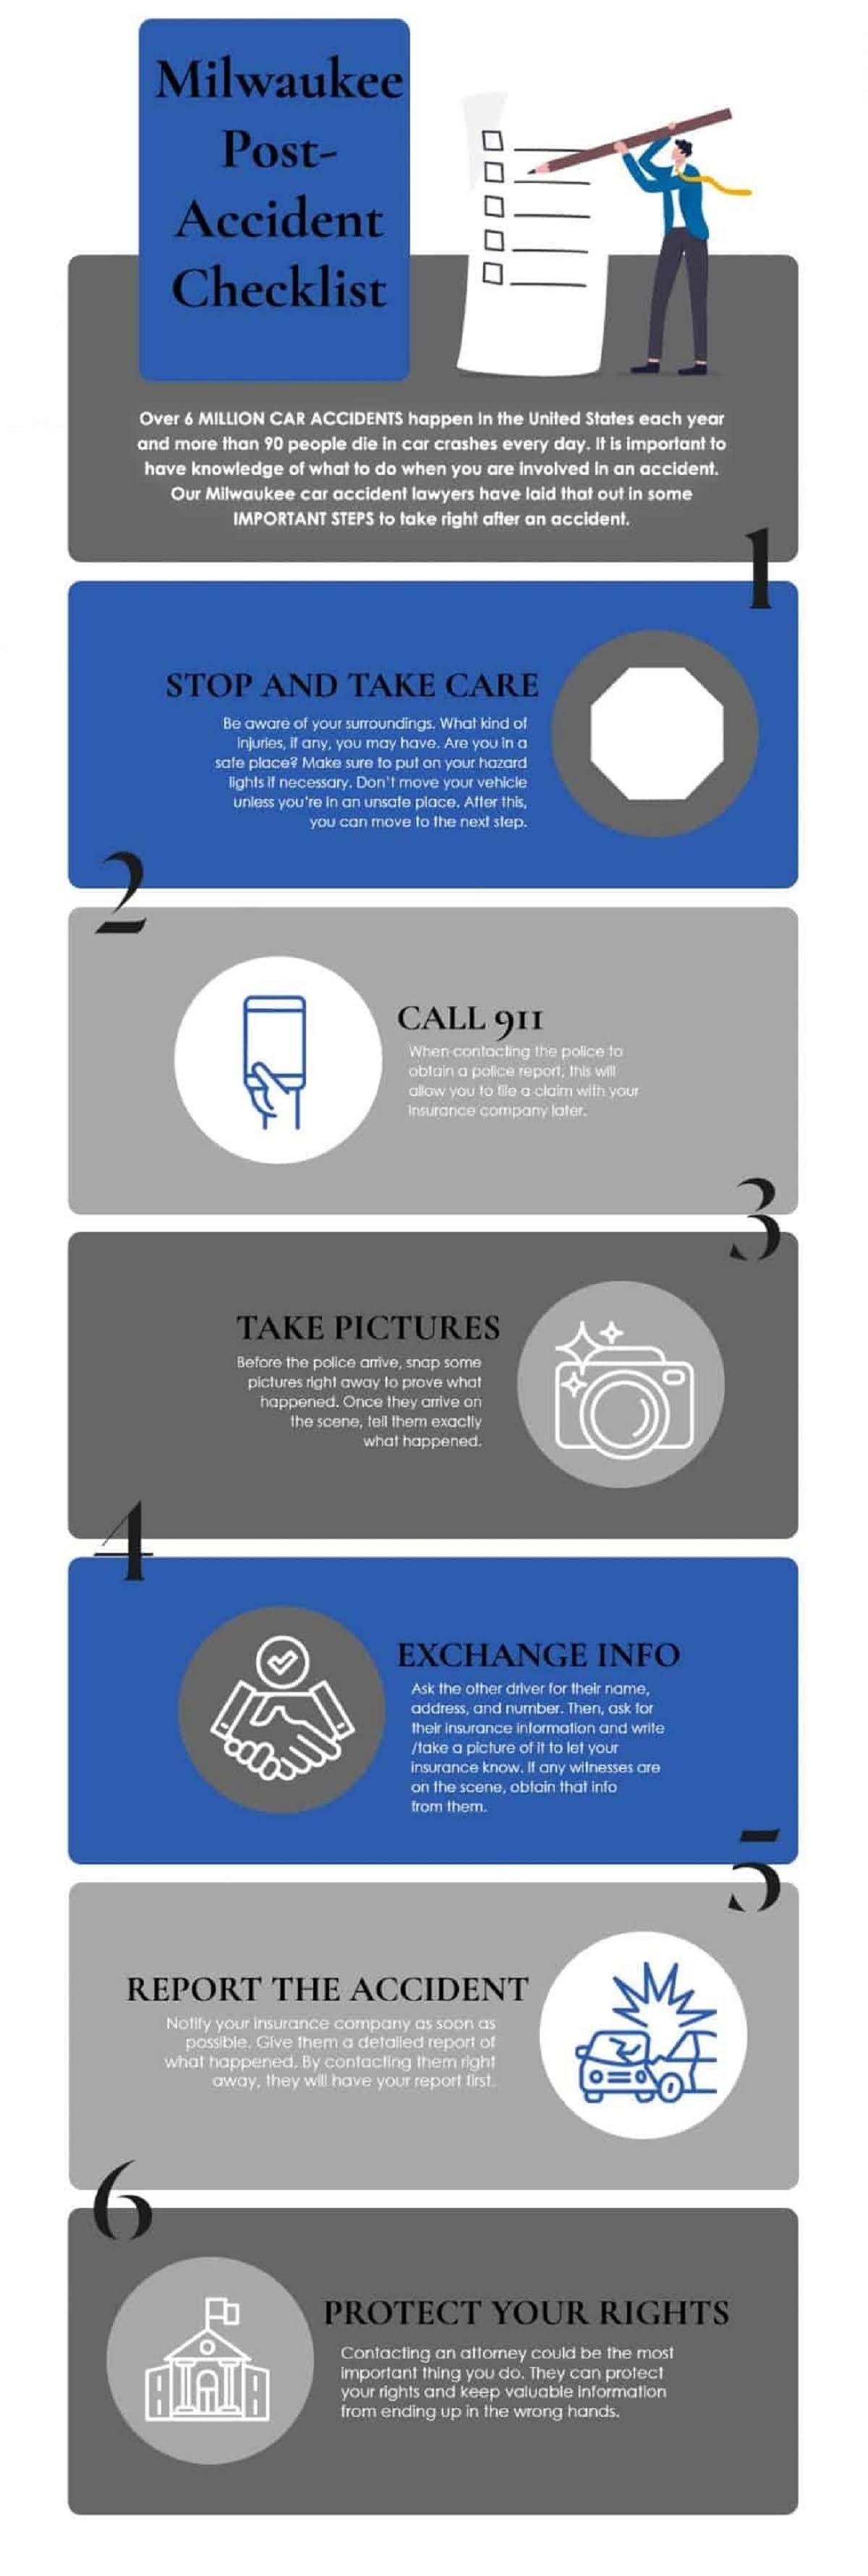 Milwaukee Post-Accident Checklist #infographic